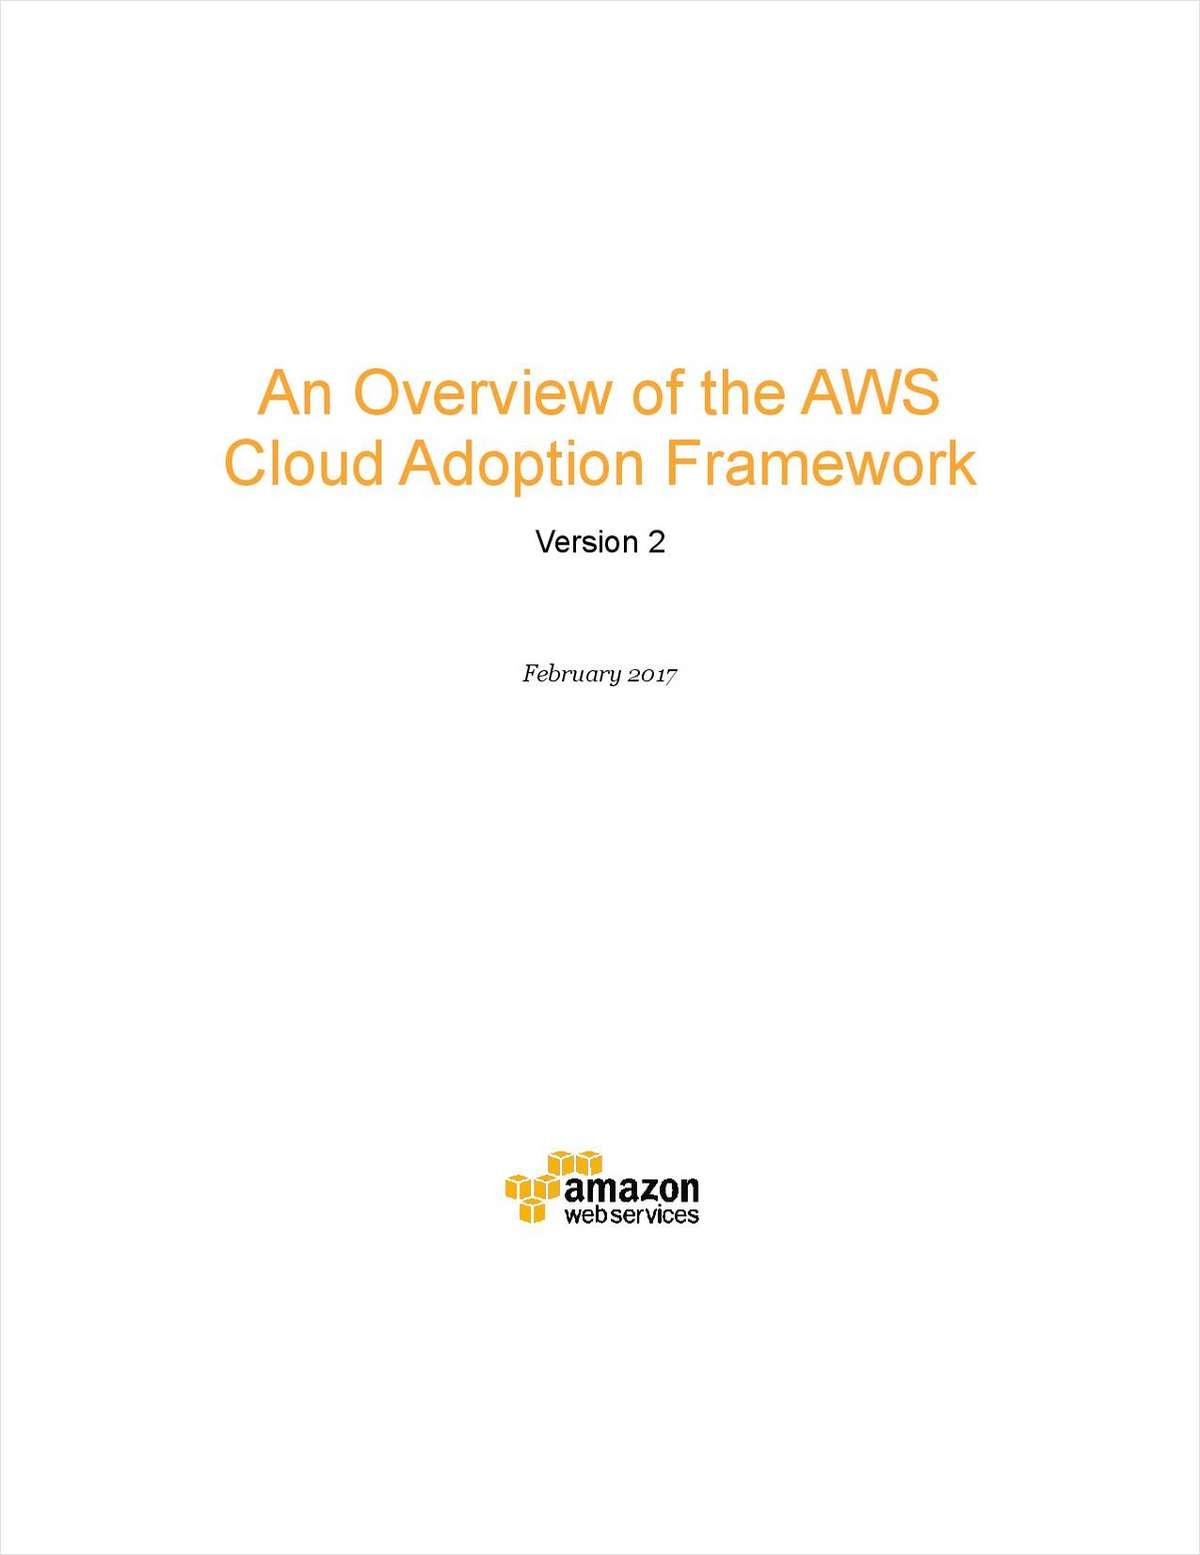 An Overview of the AWS Cloud Adoption Framework